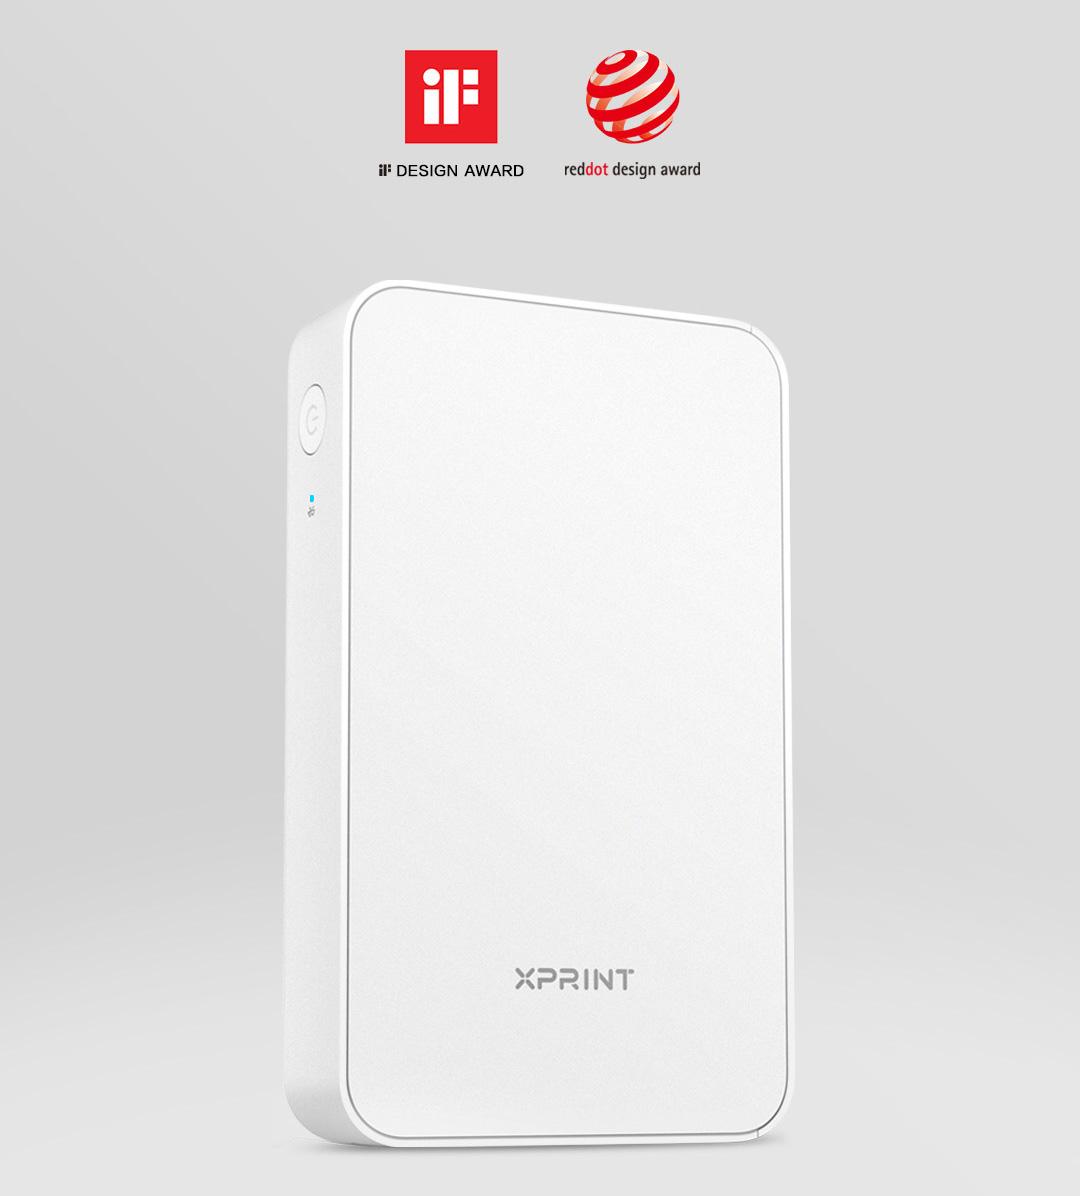 Xiaomi XPrint Pocket AR Bluetooth Photo Printer